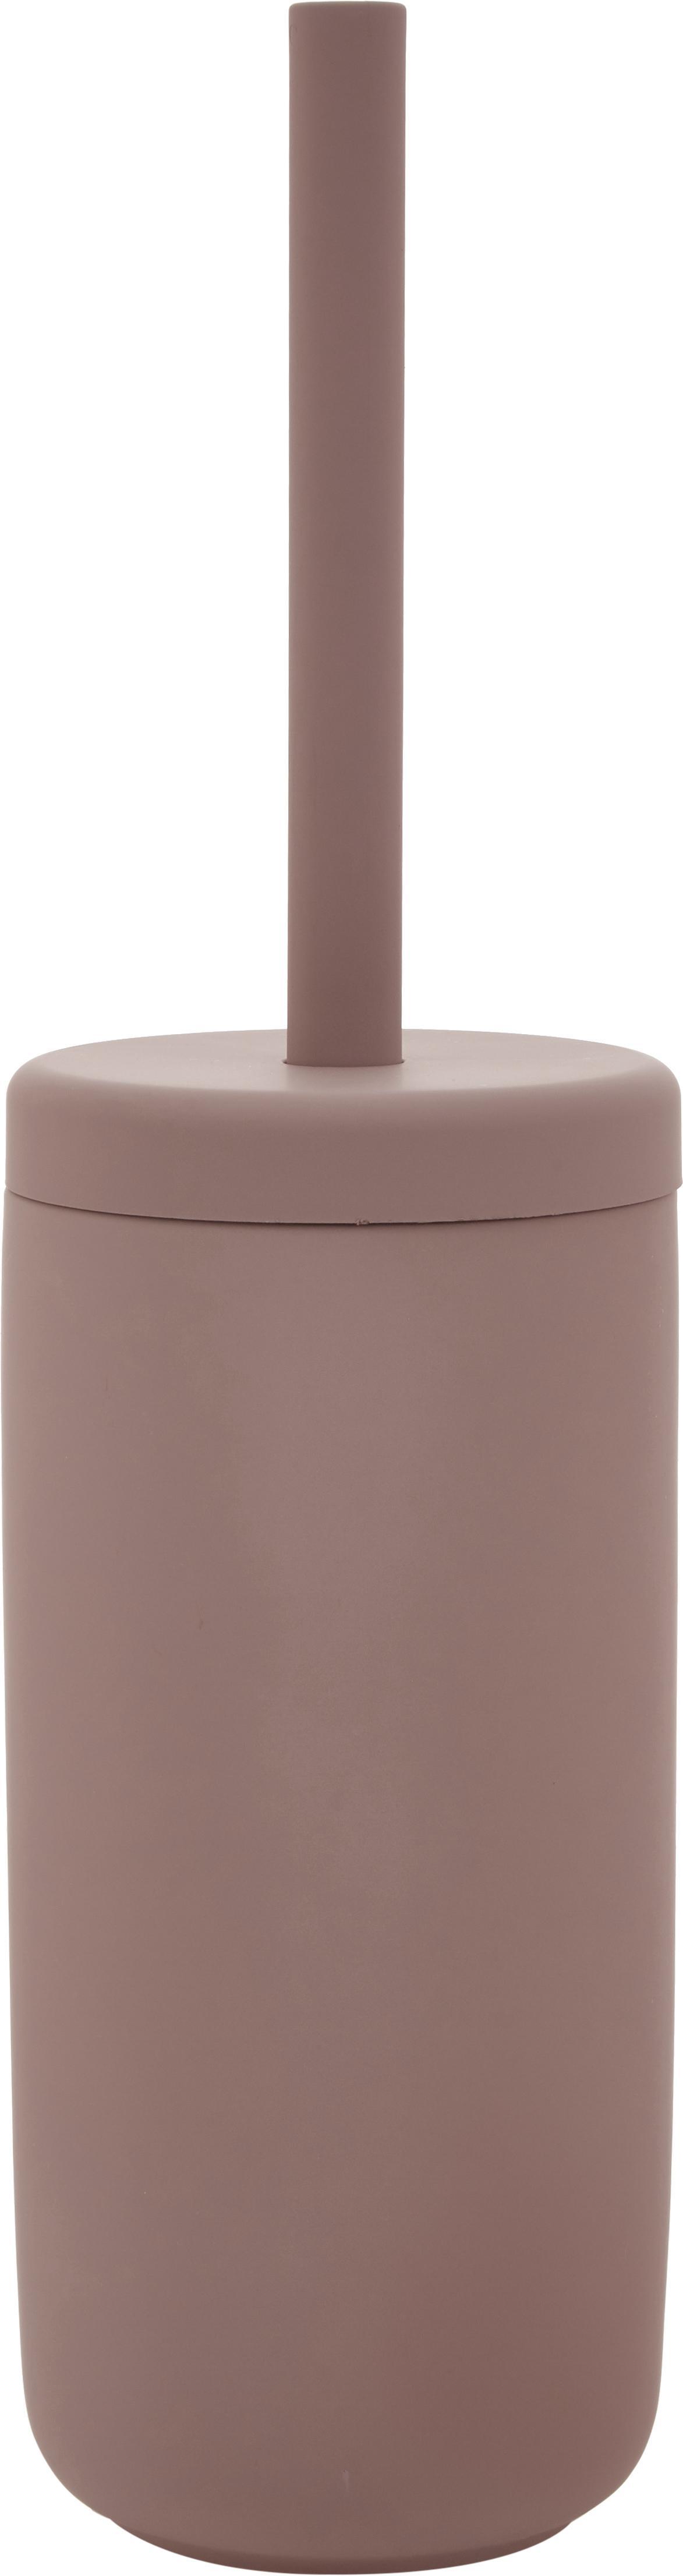 Toiletborstel Omega, Mat poederroze, Ø 10 x H 39 cm